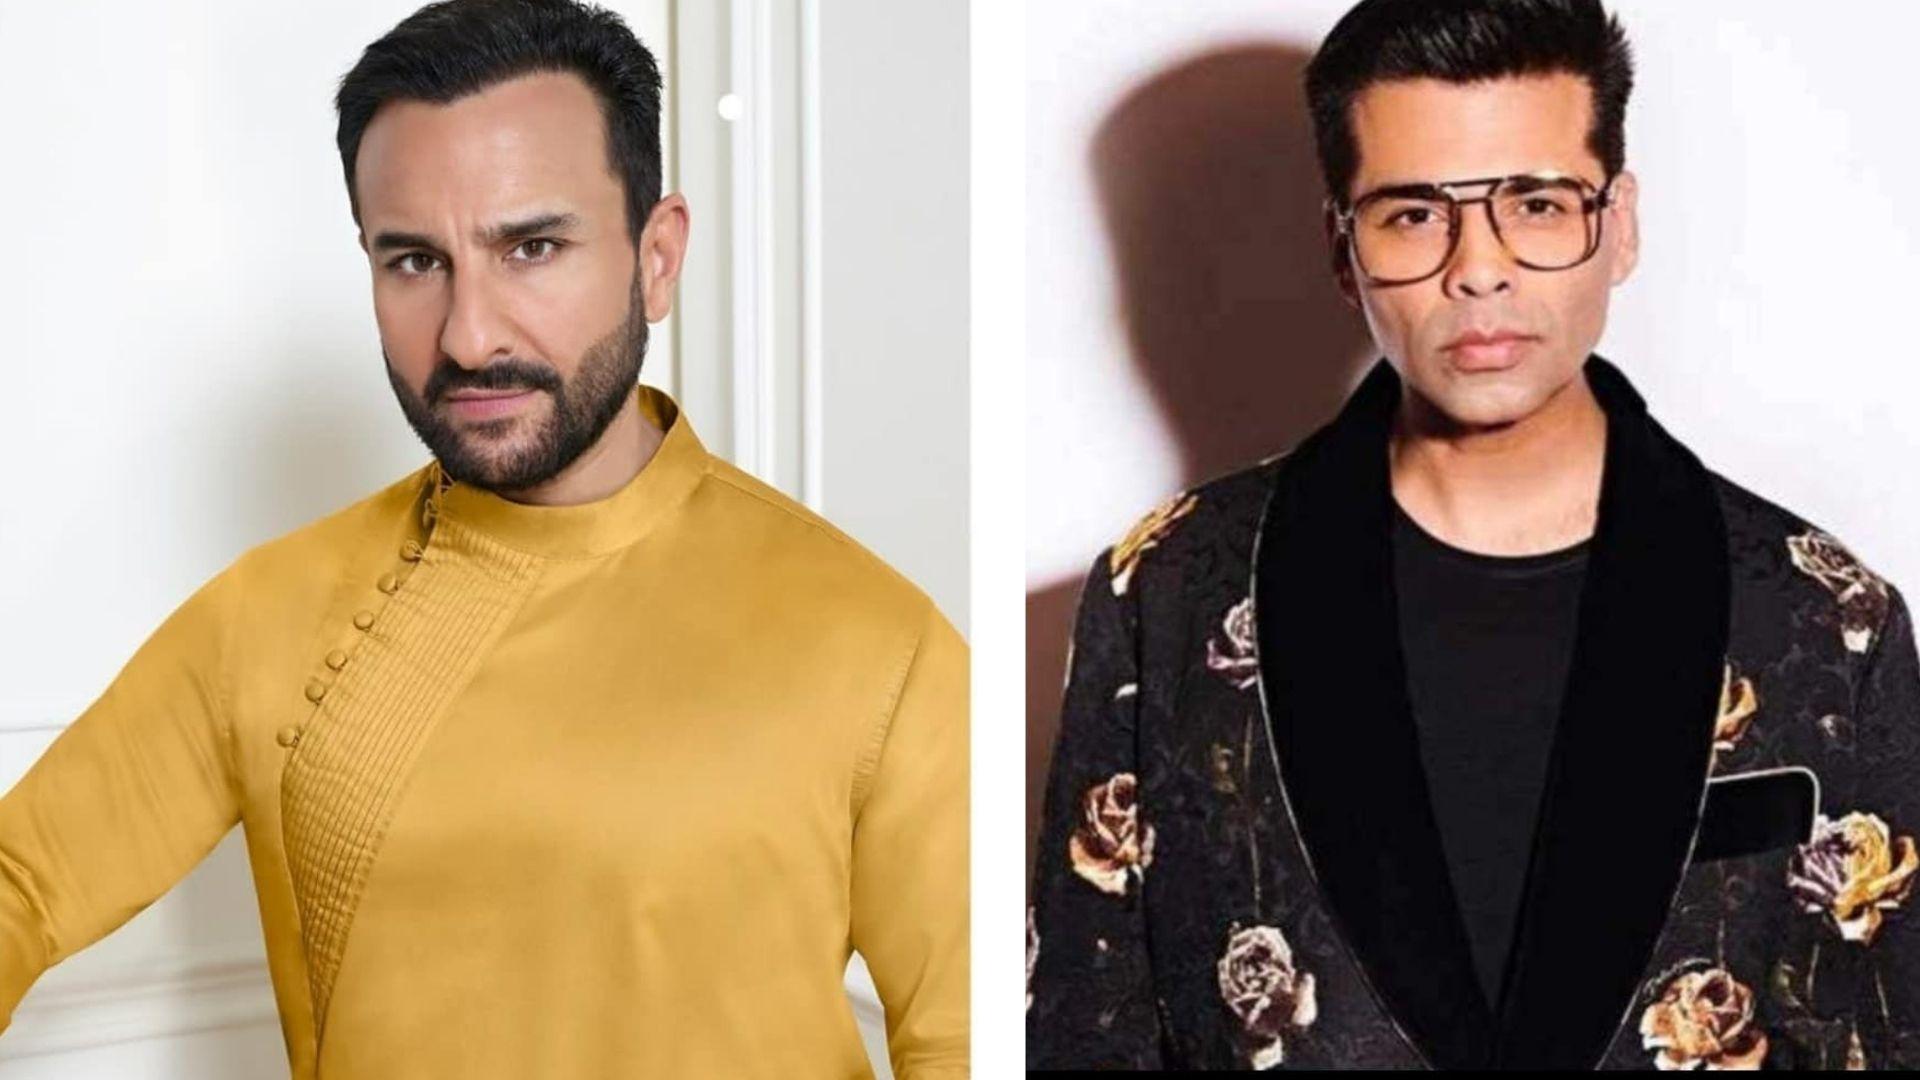 Saif Ali Khan's Son Ibrahim Will Be Assisting Karan Johar On Rocky Aur Rani Ki Prem Kahani Sets As An Assistant Director, Confirms Actor